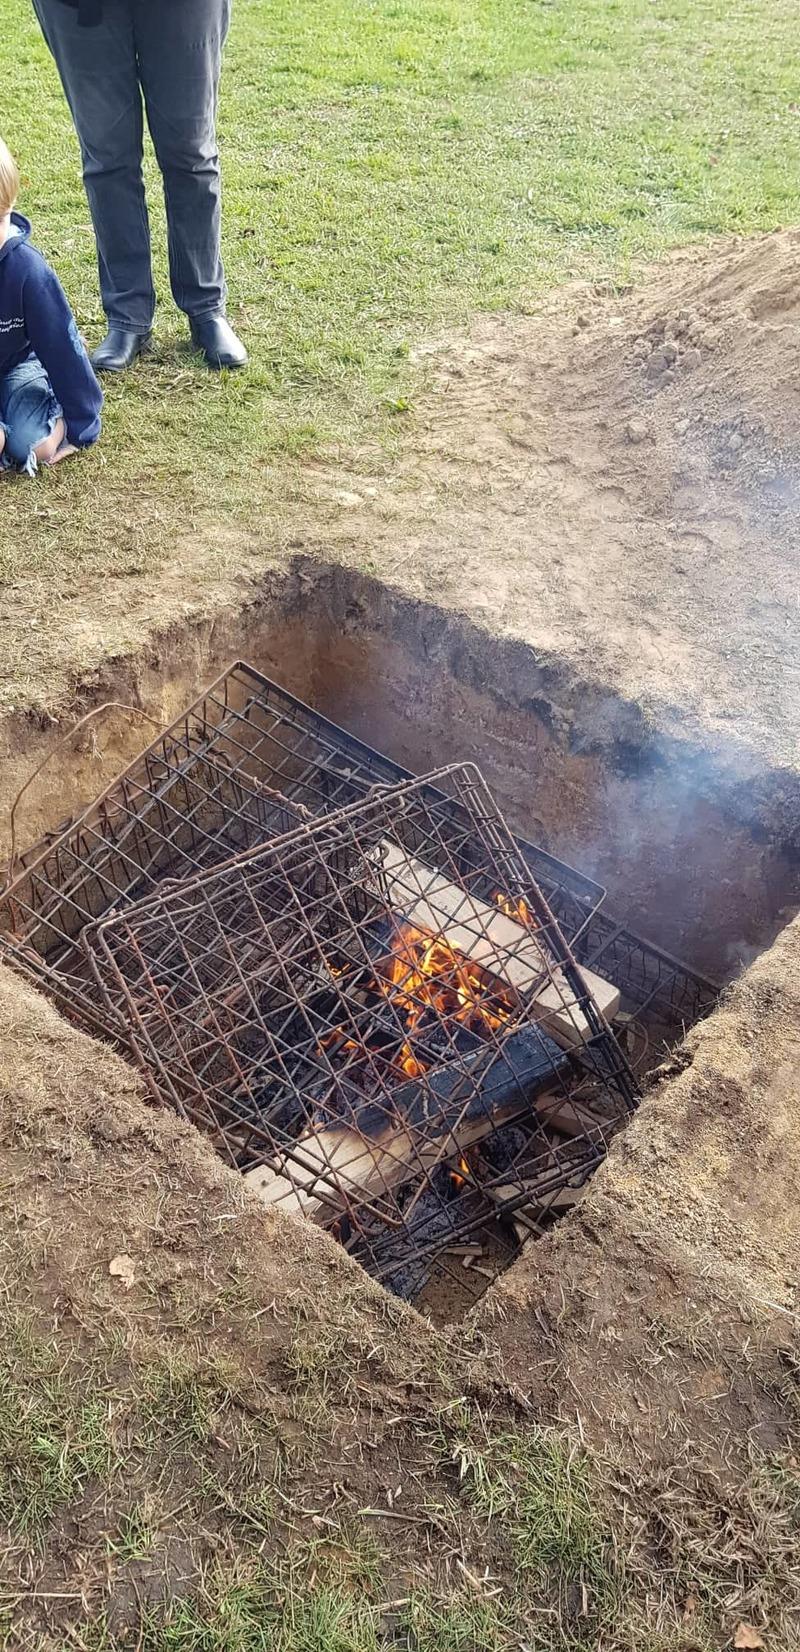 Preparing The Hangi Fire11